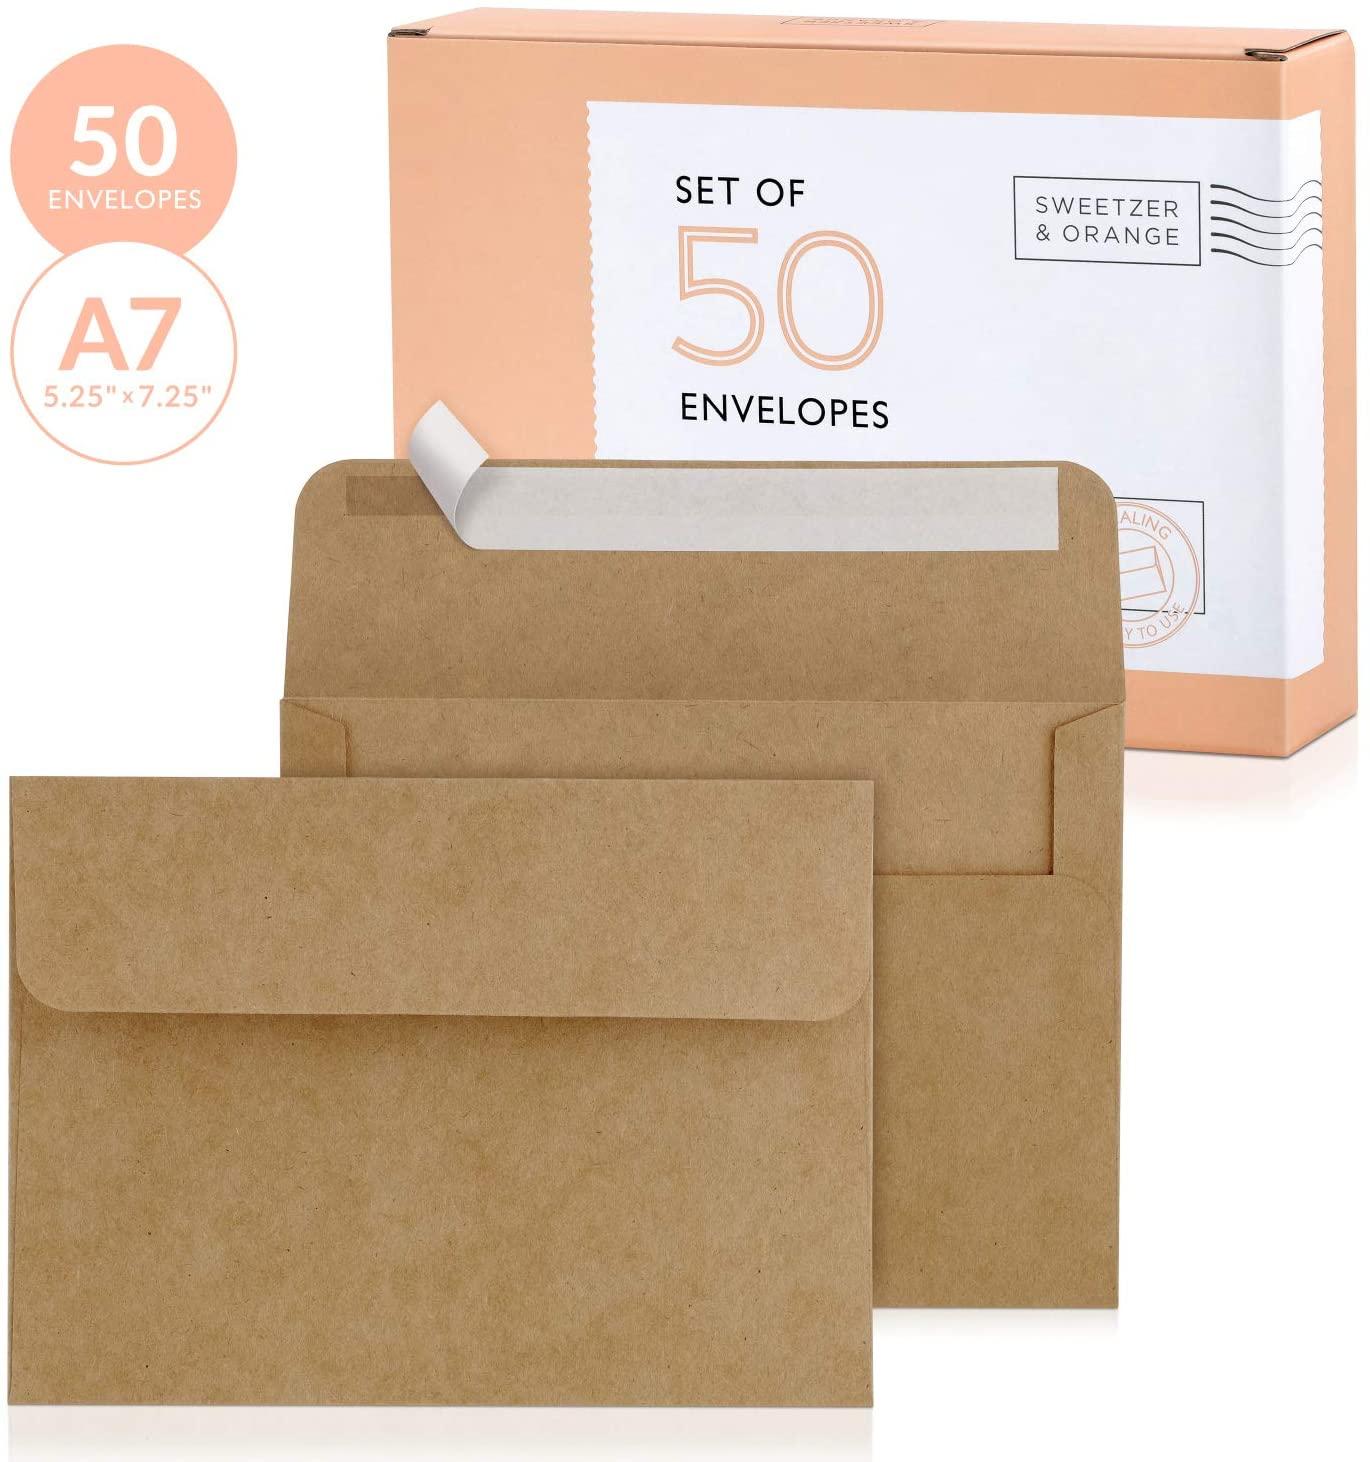 Sweetzer & Orange, Kraft Envelopes Self Seal. 50x Envelope with Box. Mailing Envelopes 5x7 (True 5.25 x 7.25 in.) Brown 150gsm Self Sealing Envelopes, Blank A7 Envelopes for Invitations and Wedding